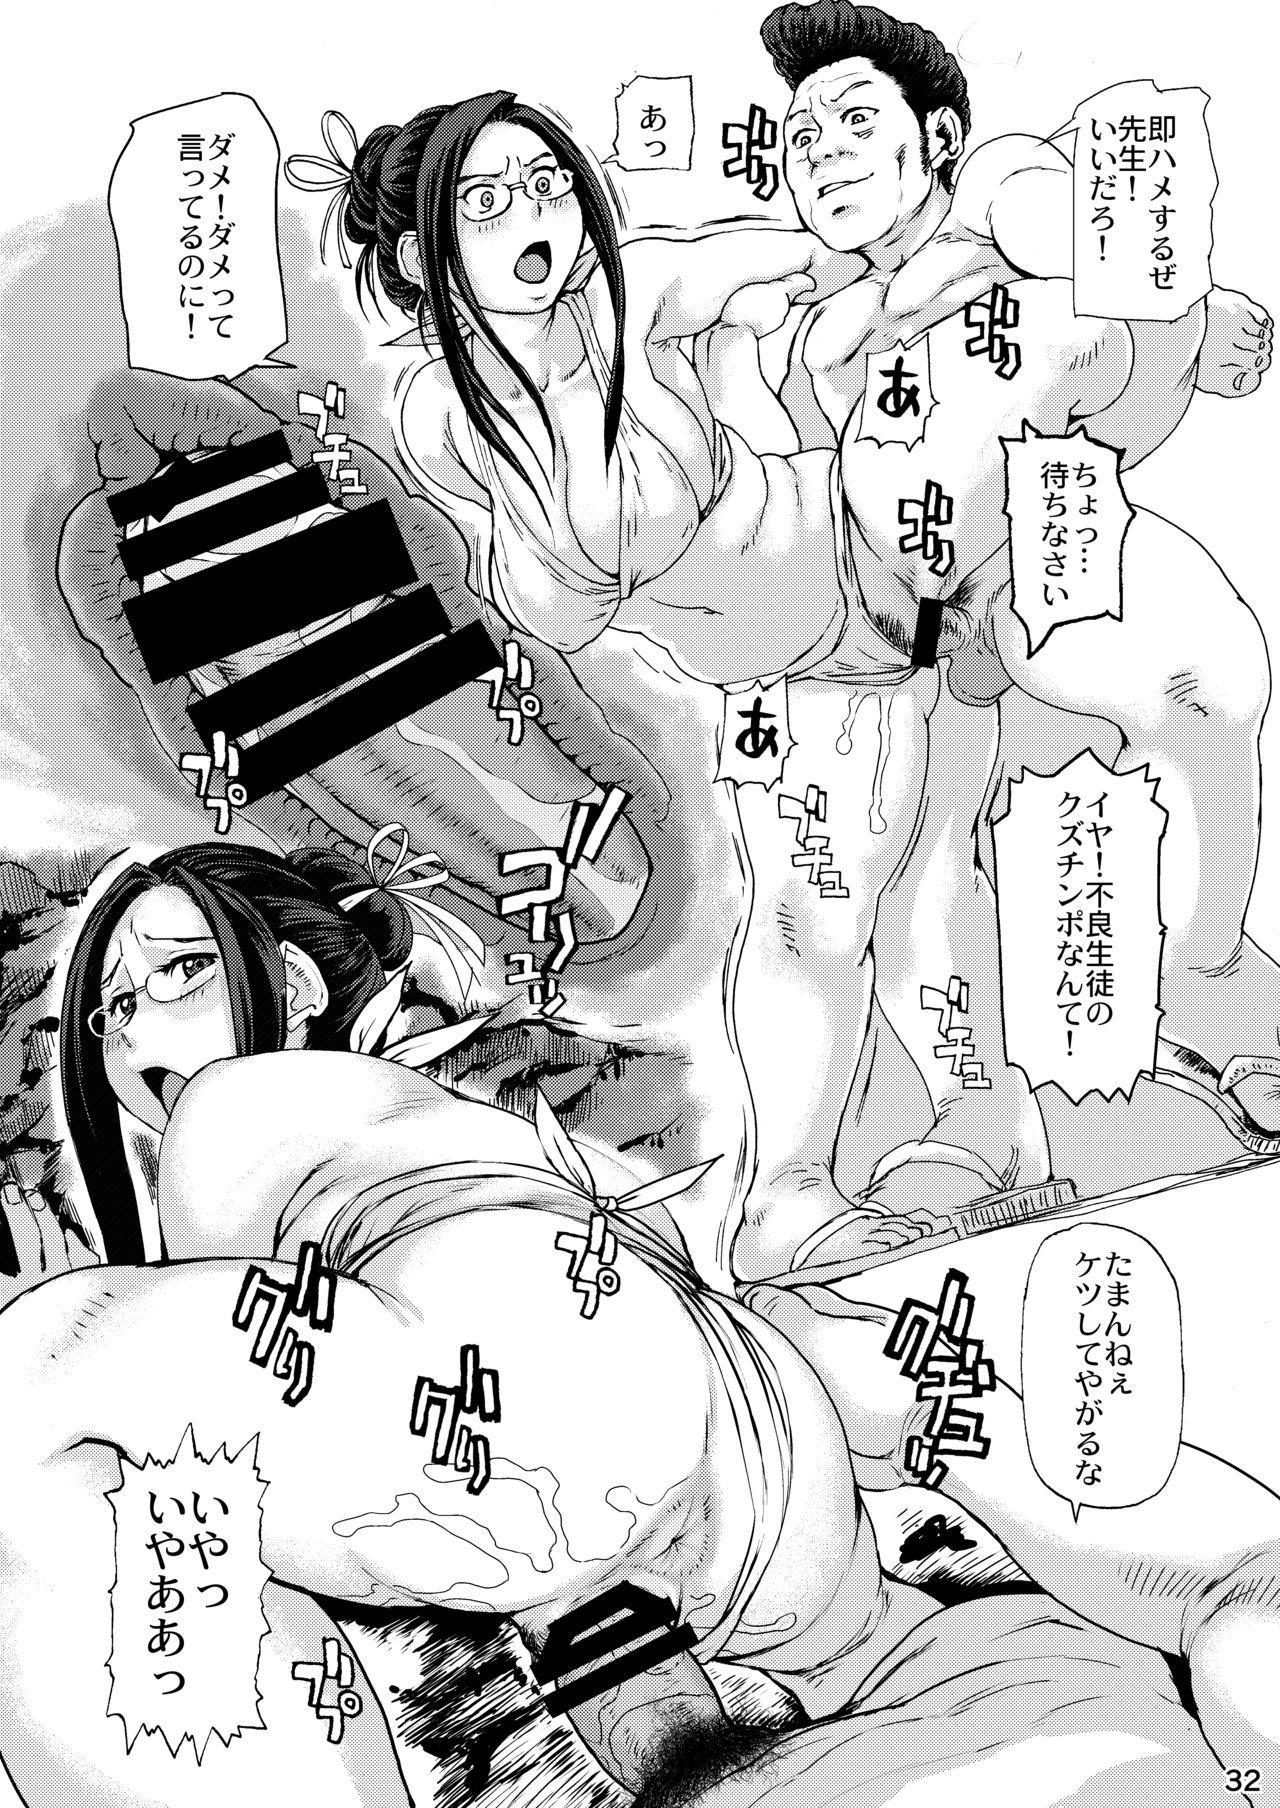 CA〇COM(&MORE!) VS FIGHTING GIRLS Swimsuit&Gangbang Special 30